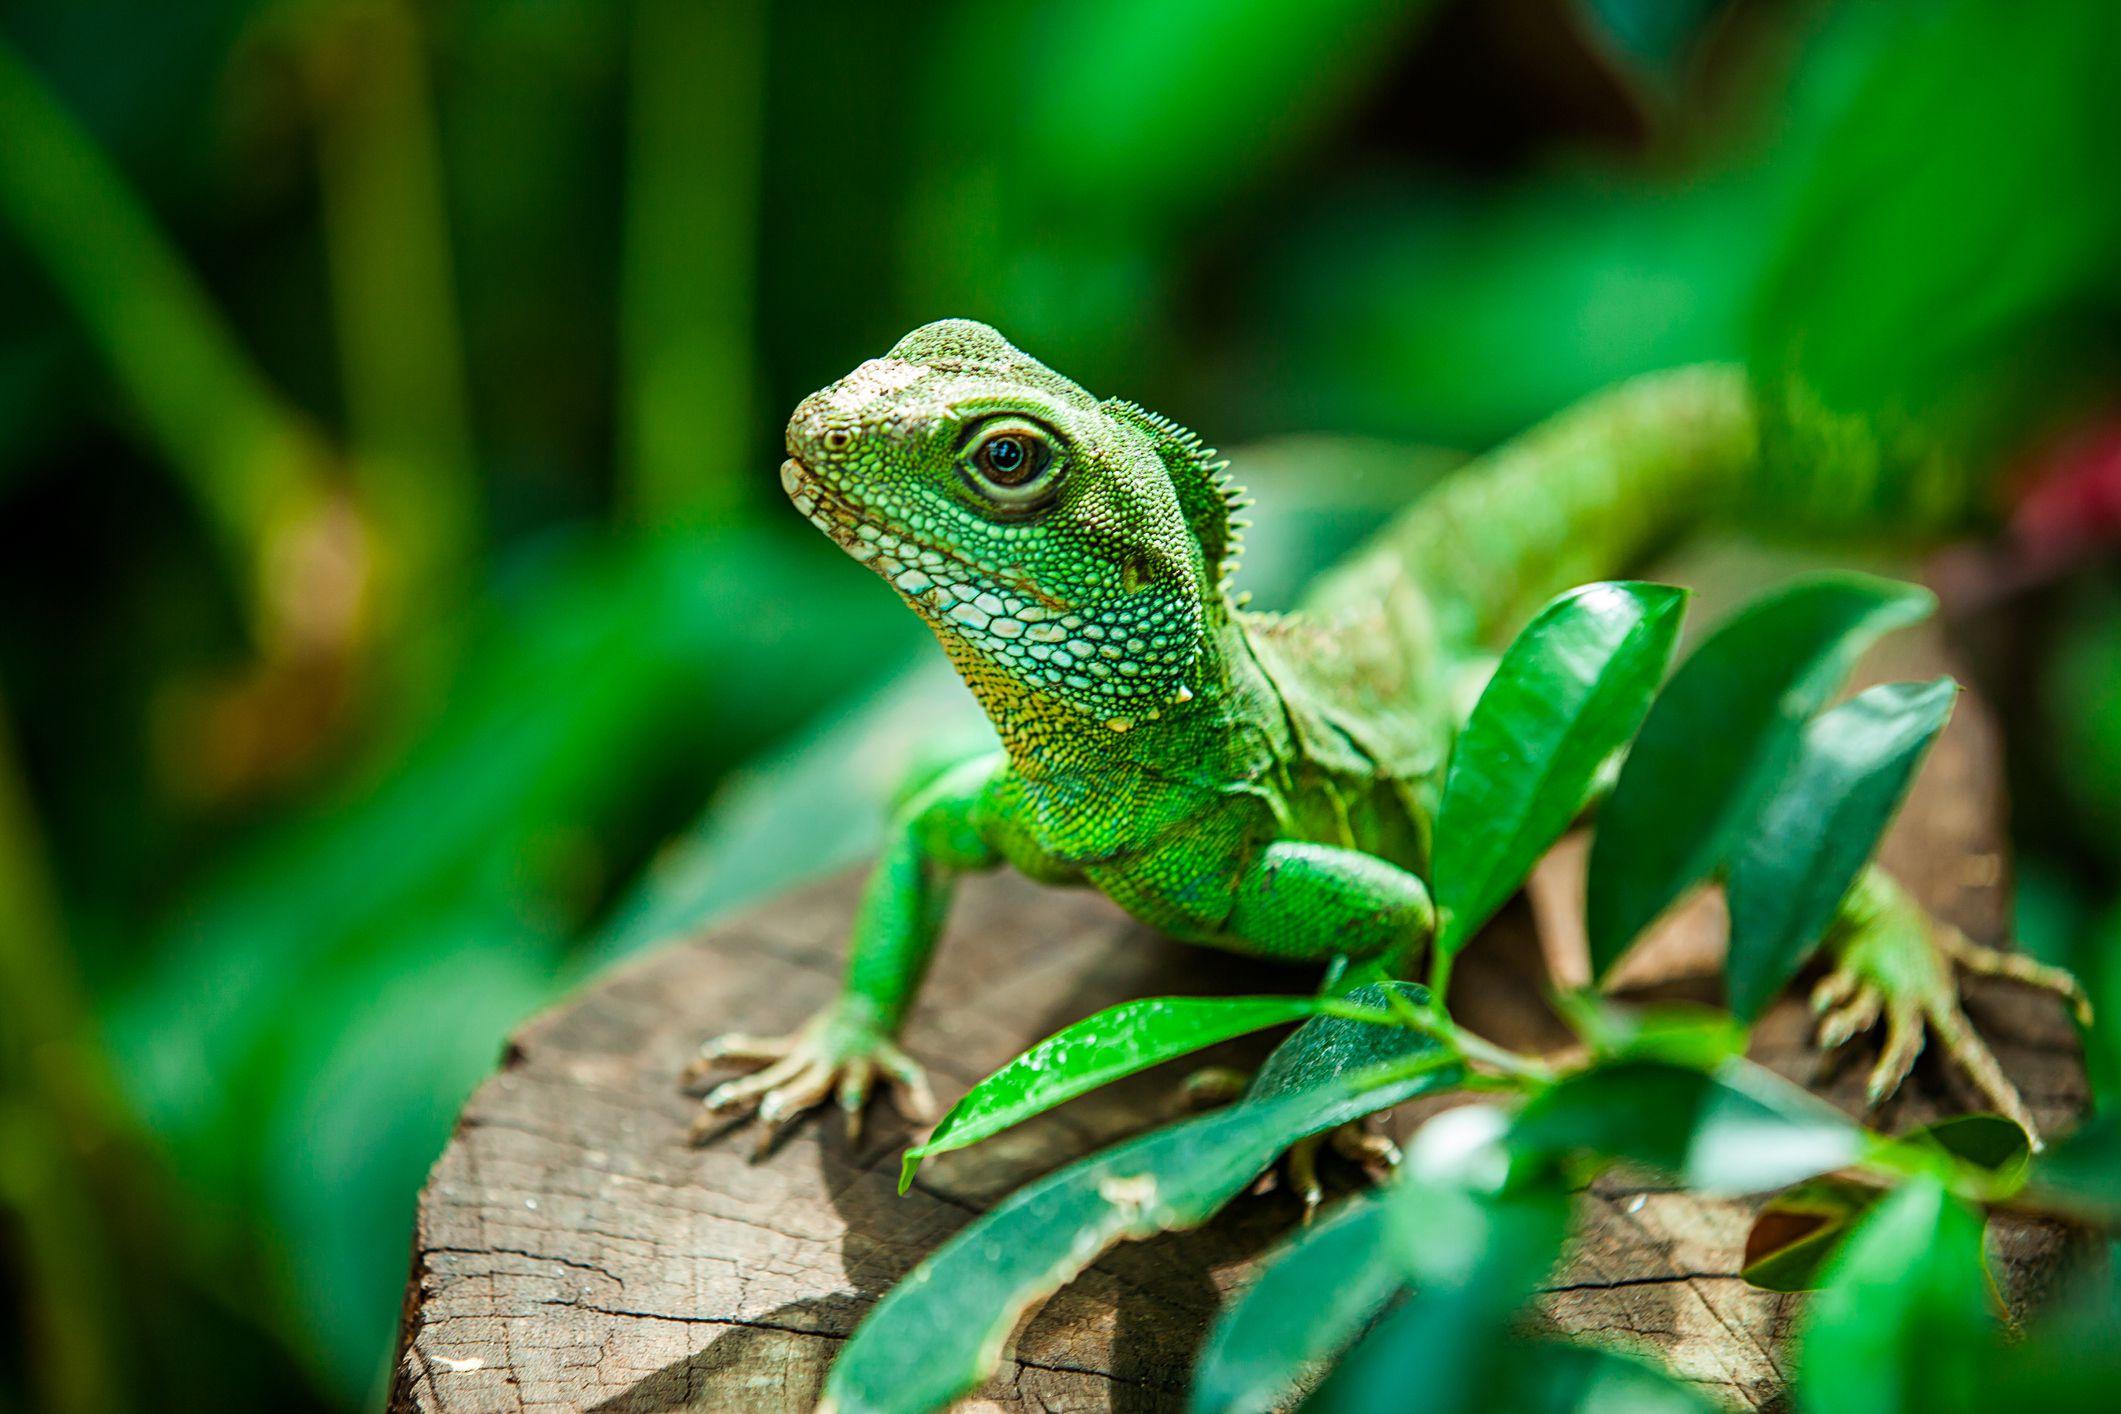 reptiles water dragon characteristics amphibians land chinese fish distinguish similar